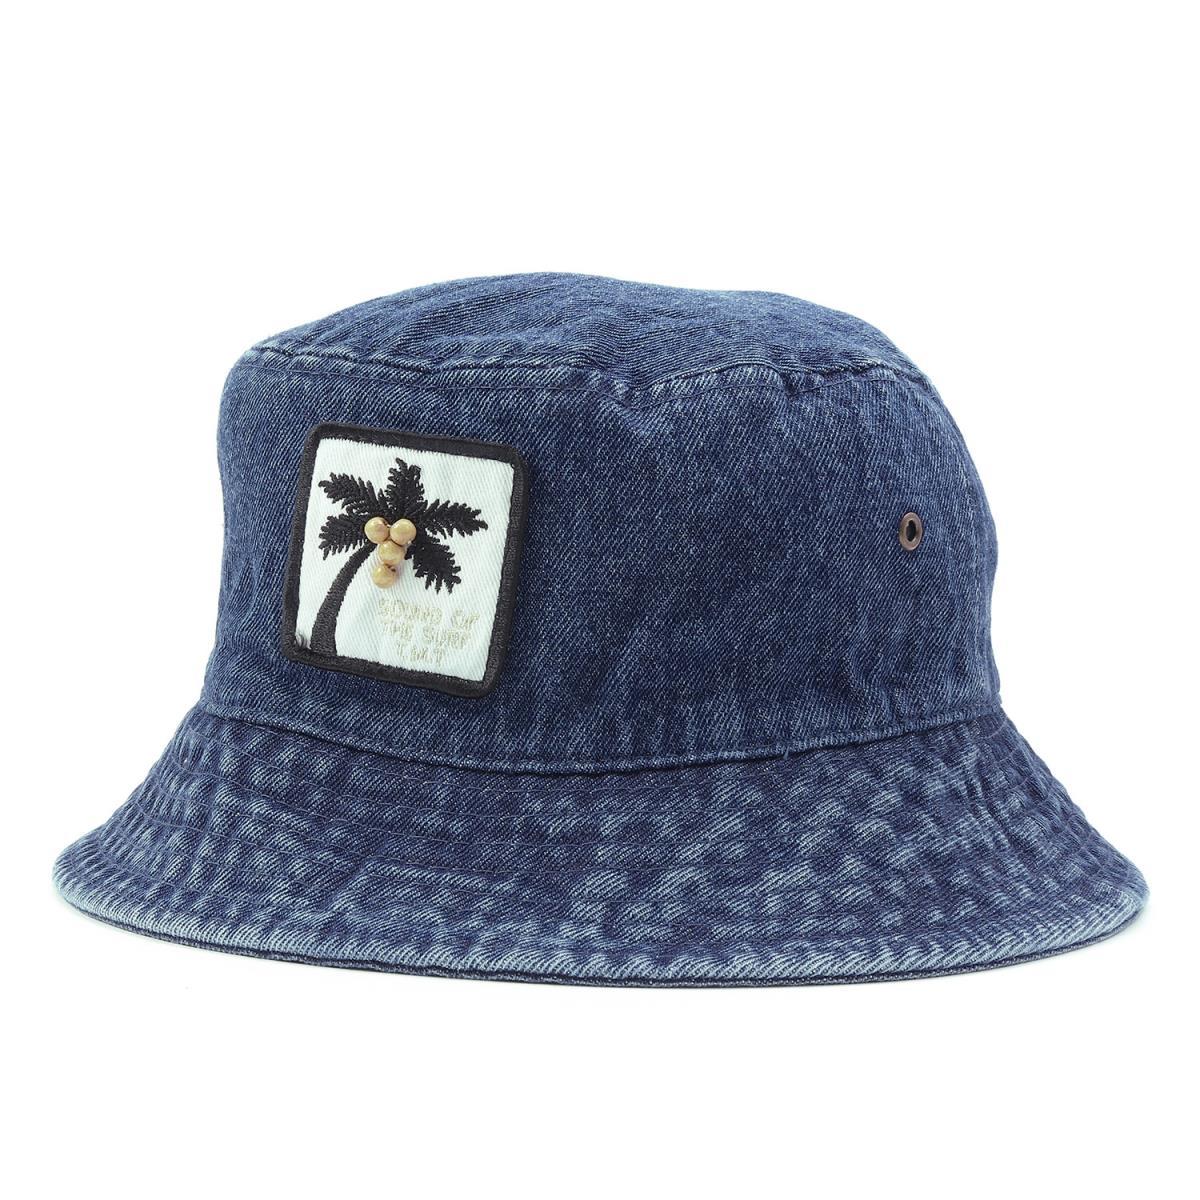 Denim pail hat (DENIM BUCKET HAT PALM TREE) indigo M with the TMT (tea M  tea) 17A W palm tree emblem 341c2297a84